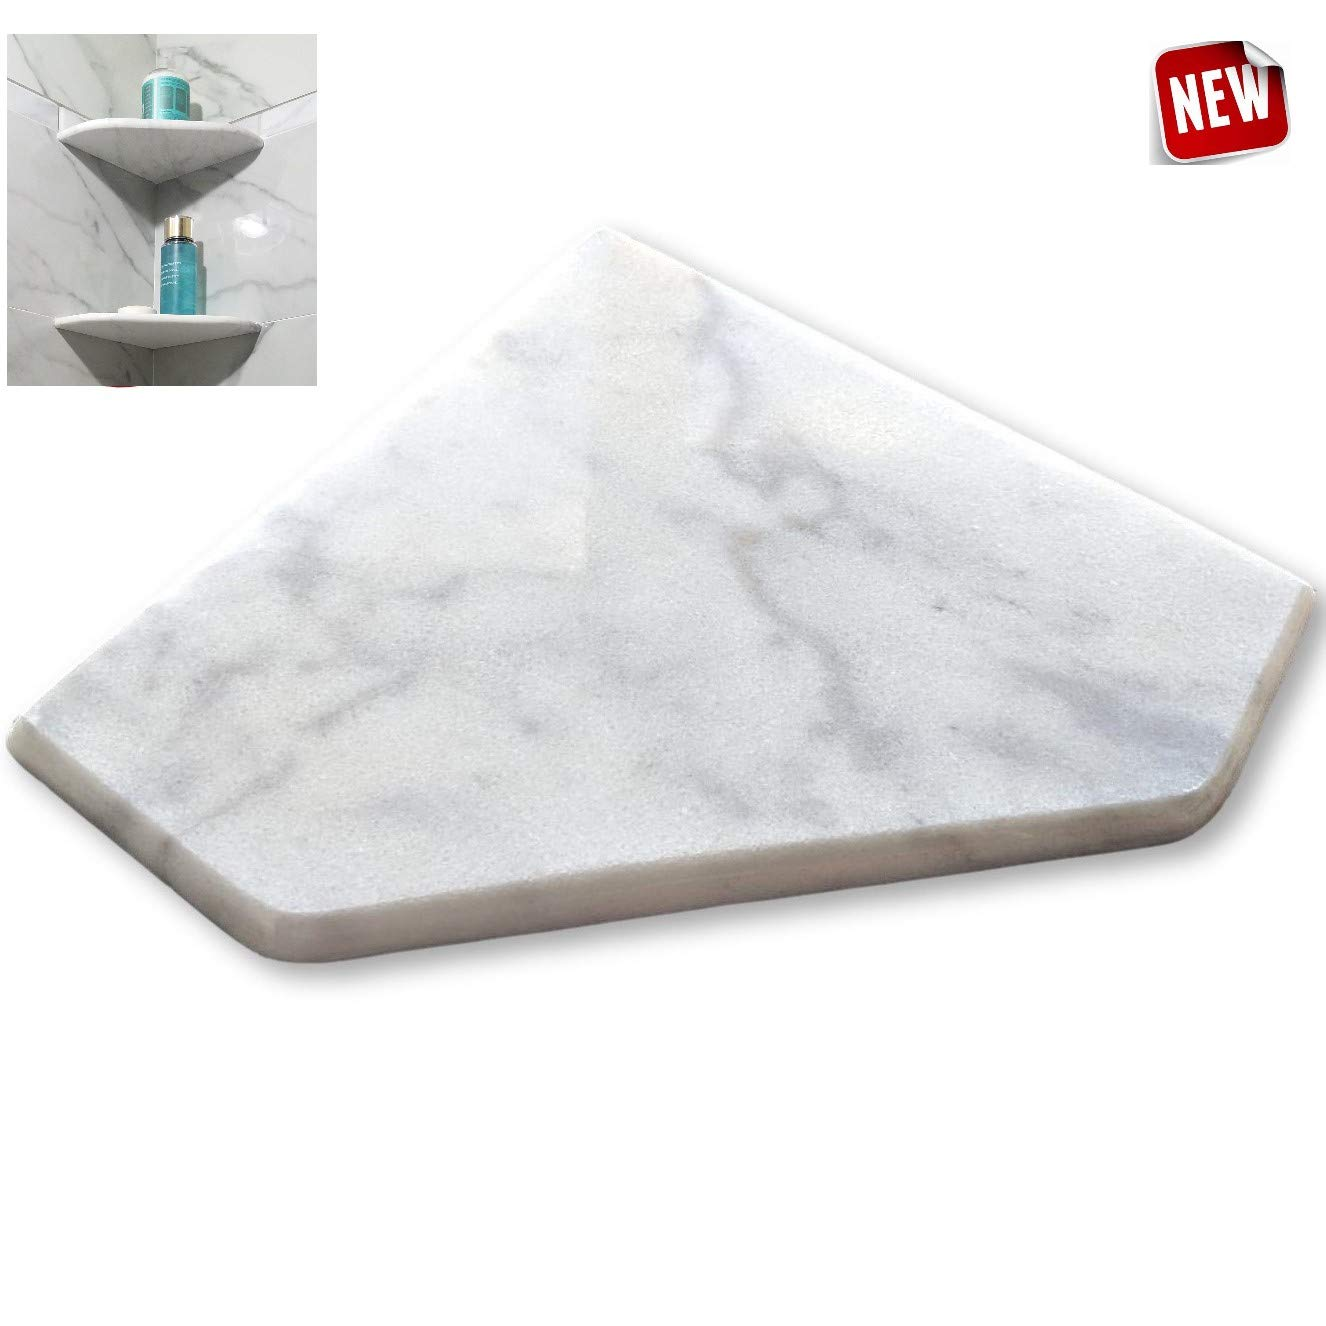 EZ-Mount Marble Shower Corner Shelf - Wall Attached 8'' Soap Dish with Install KIT - (XD Bianco Ibiza) Floating Stone Bathroom Caddy - Shampoo Holder